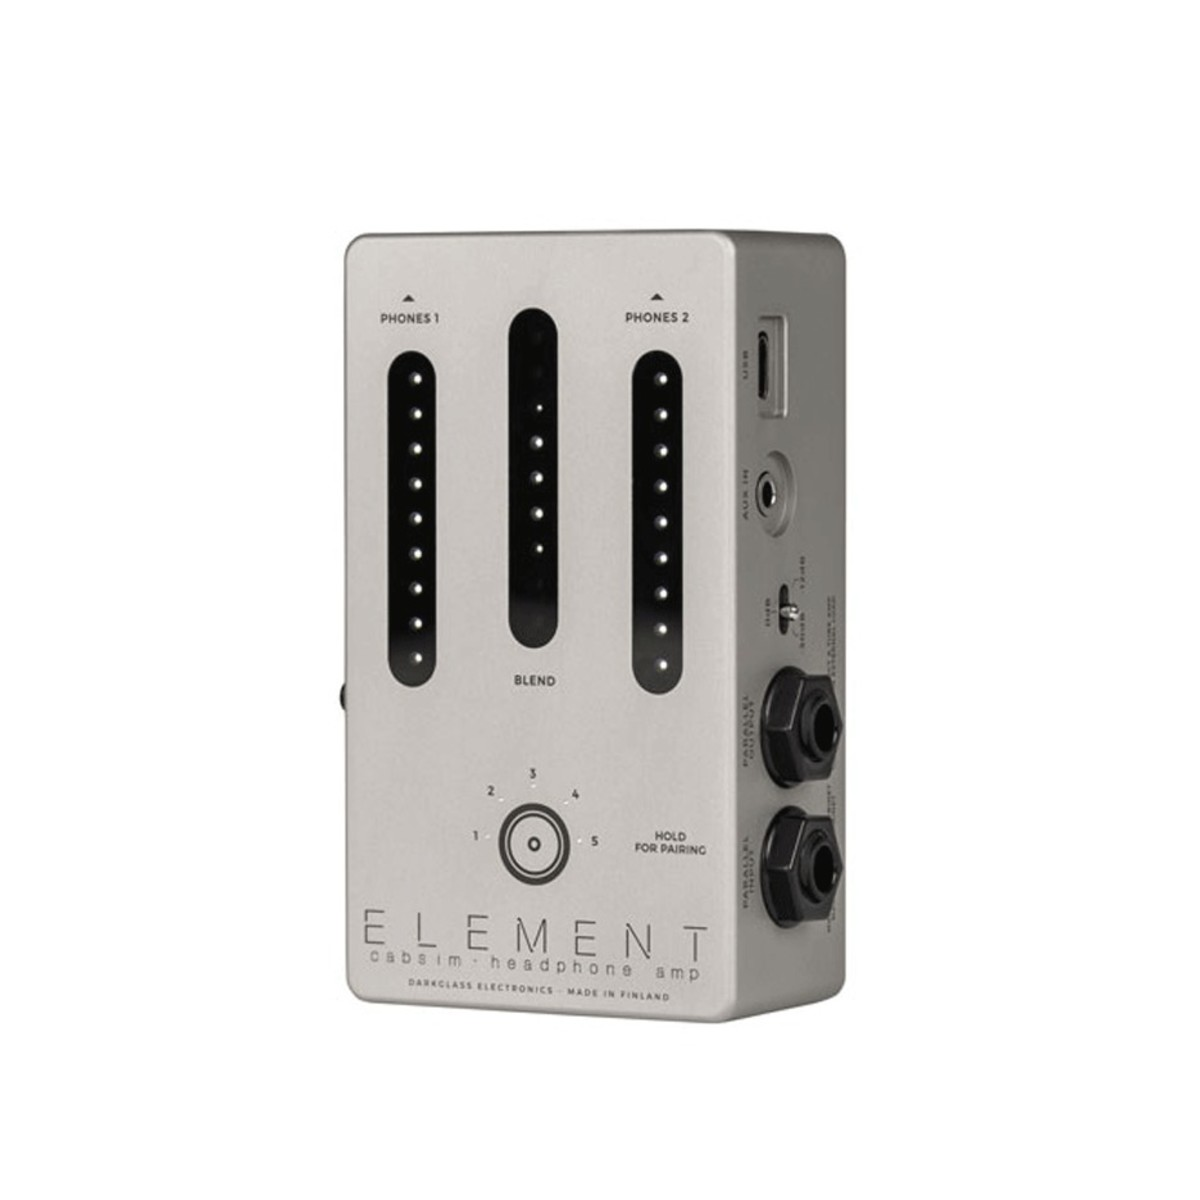 Darkglass Element Headphone Amp & Cabinet Simulator